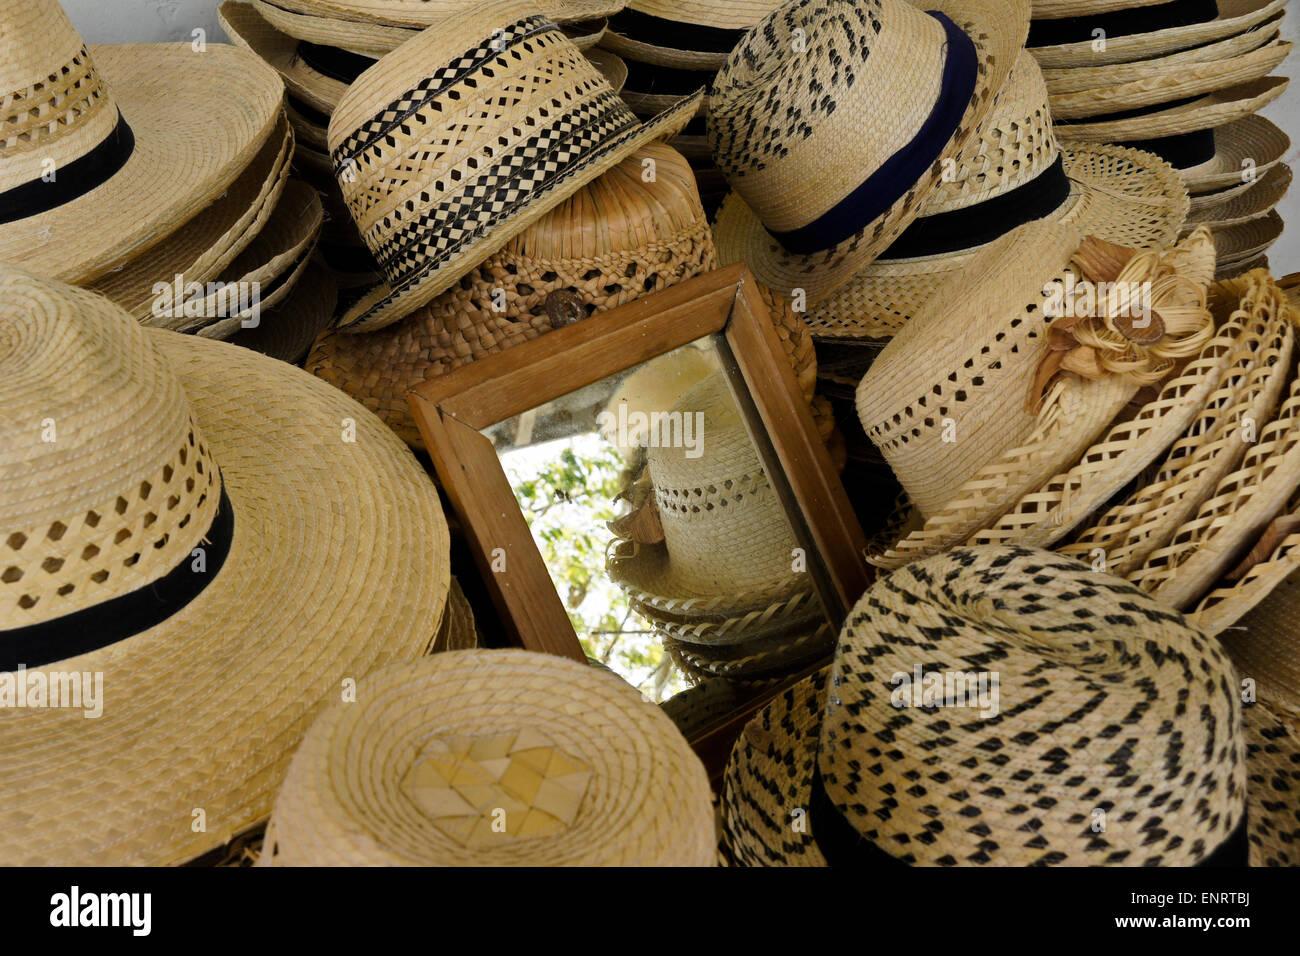 Cappelli Cubani Immagini   Cappelli Cubani Fotos Stock - Alamy 44ab2b5b9497